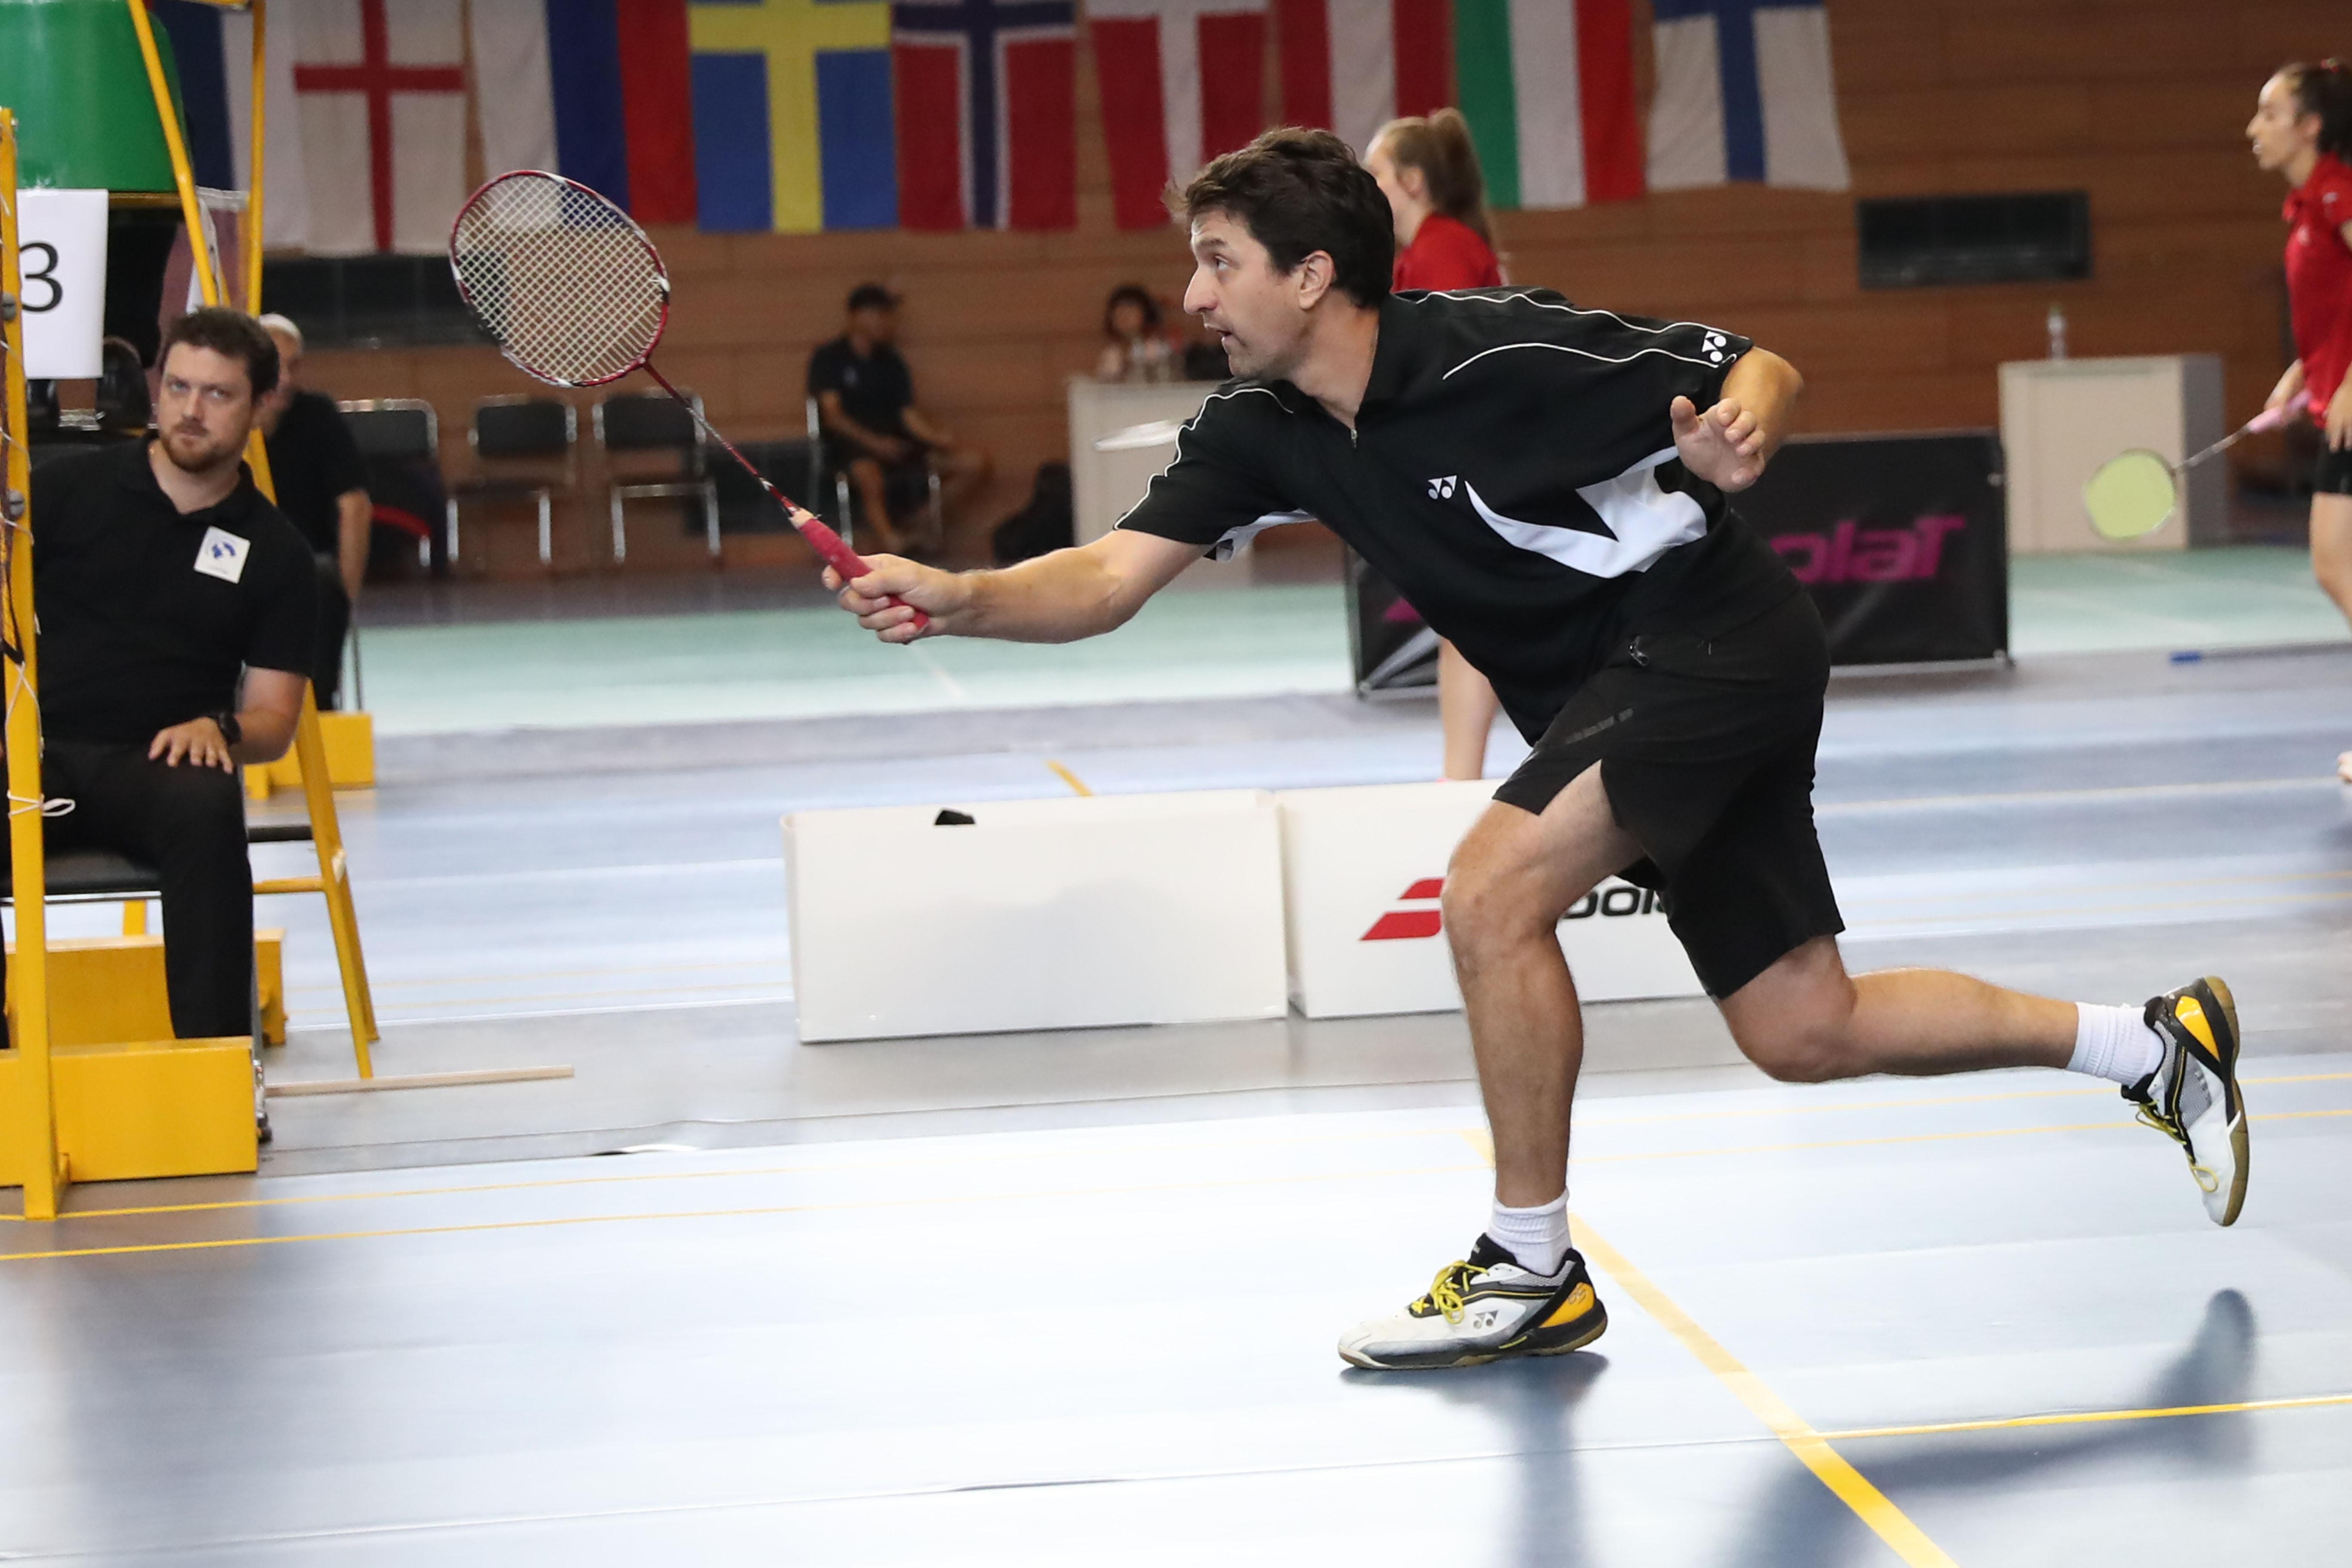 Даниел Николов постигна четири поредни победи на турнира по бадминтон